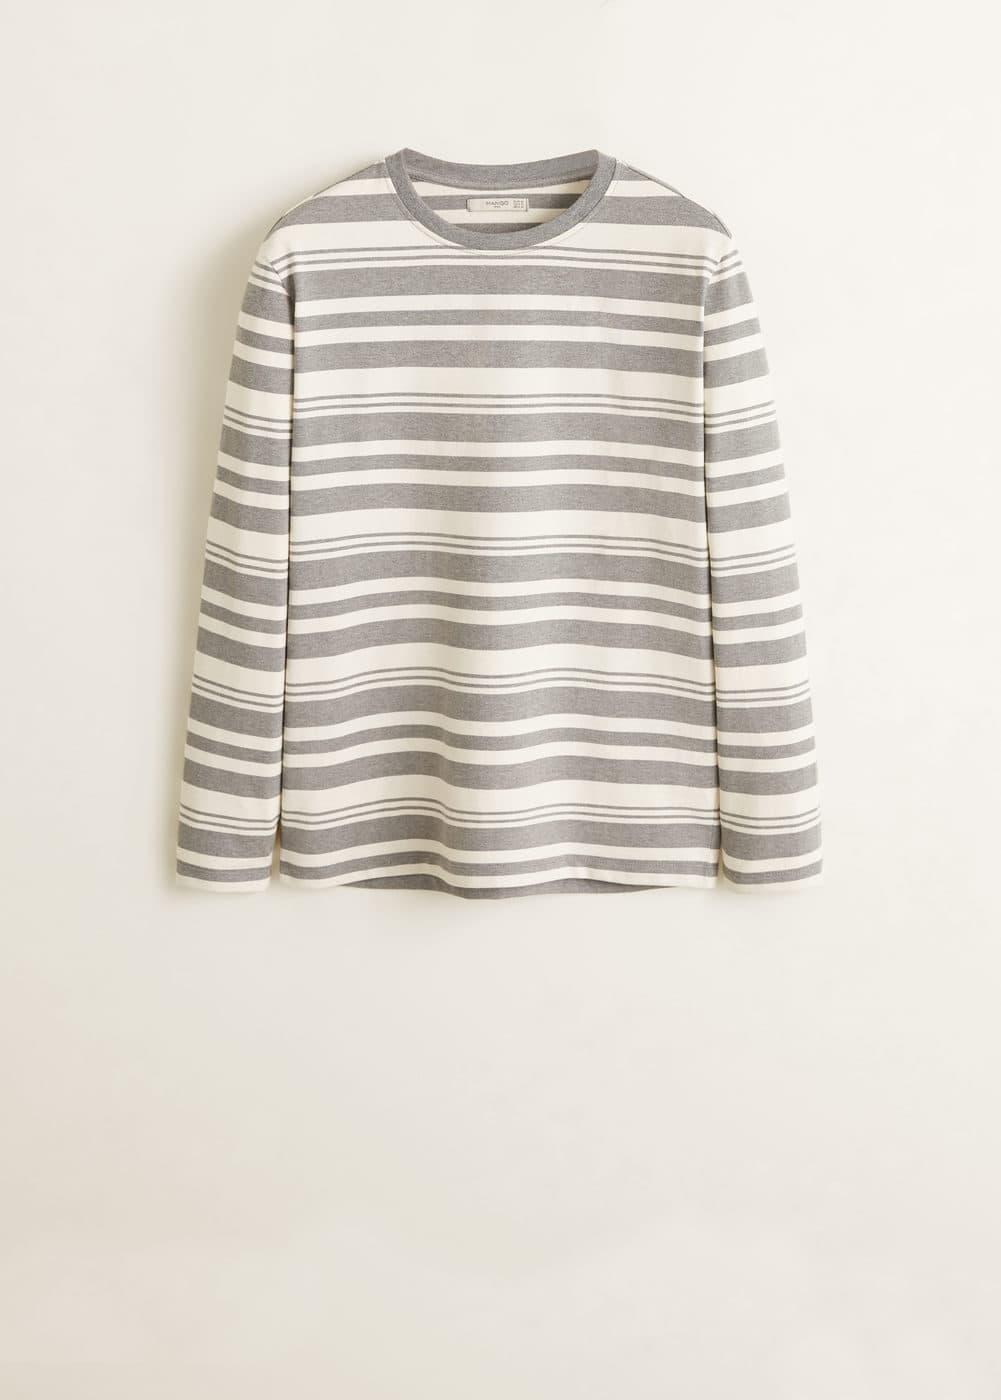 Mango - Camiseta algodón rayas - 5